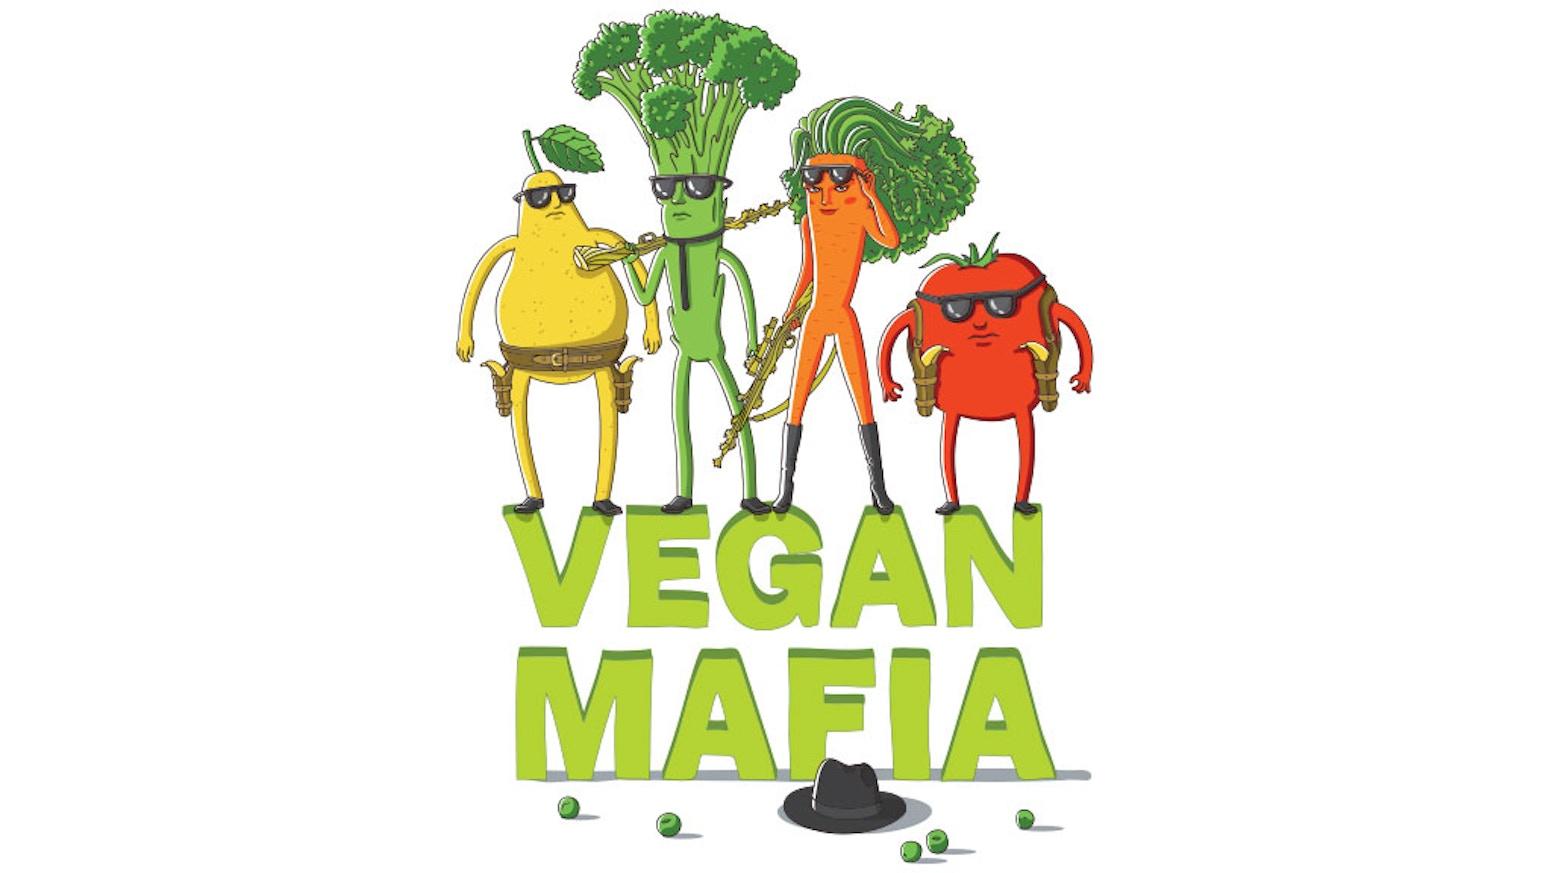 The Vegan Mafia by The Vegan Mafia — Kickstarter